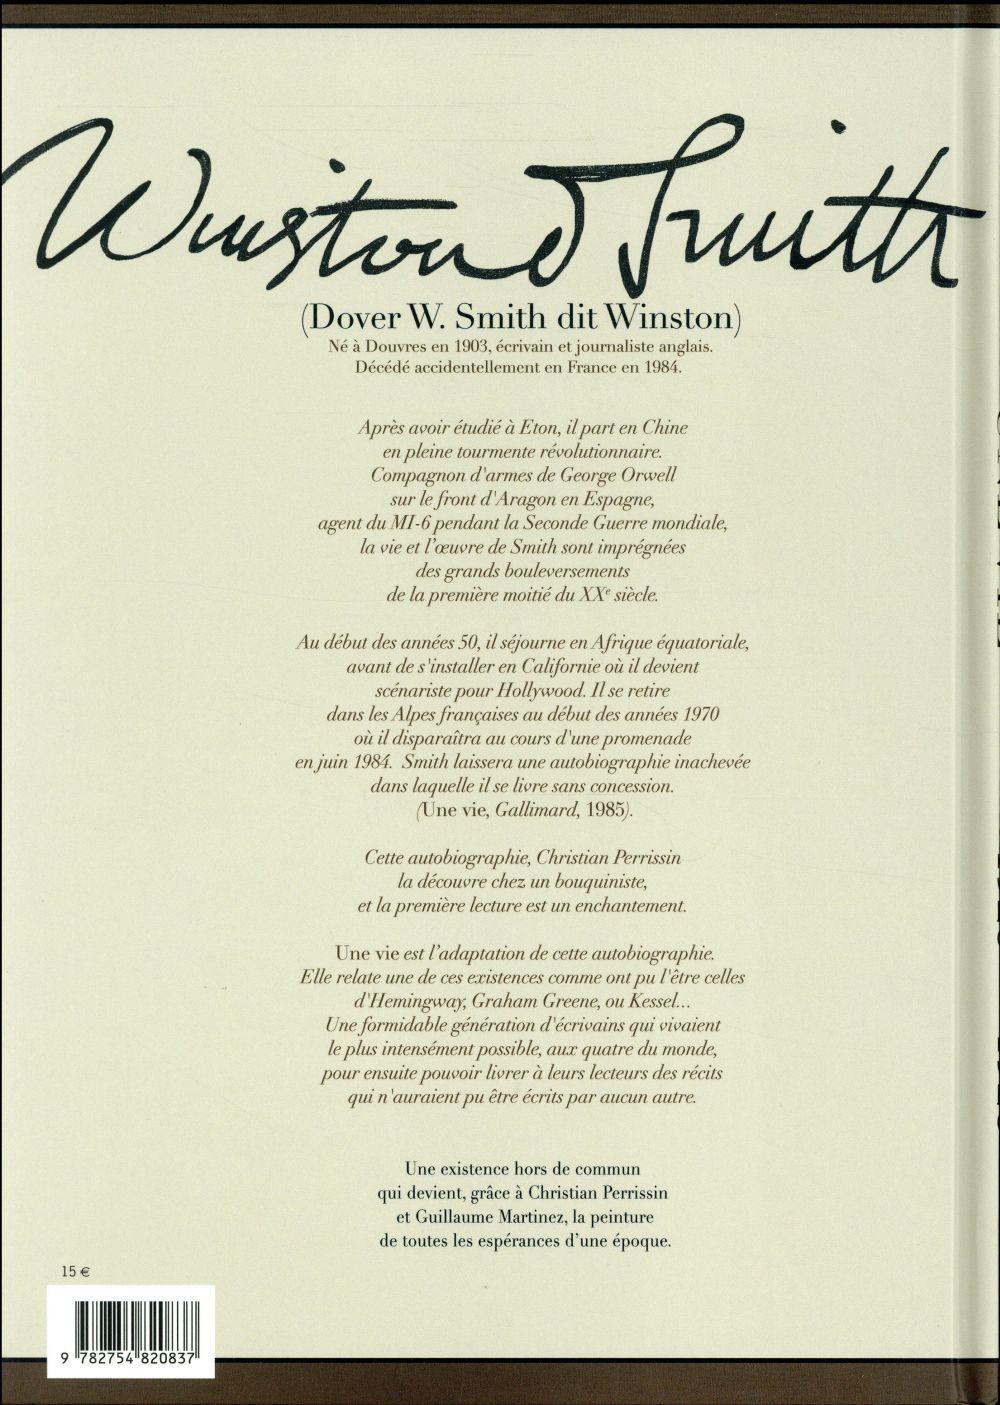 Une vie ; Winston Smith (1903-1984), la biographie retrouvée T.3 ; mars 1925-avril 1926, a chinese year